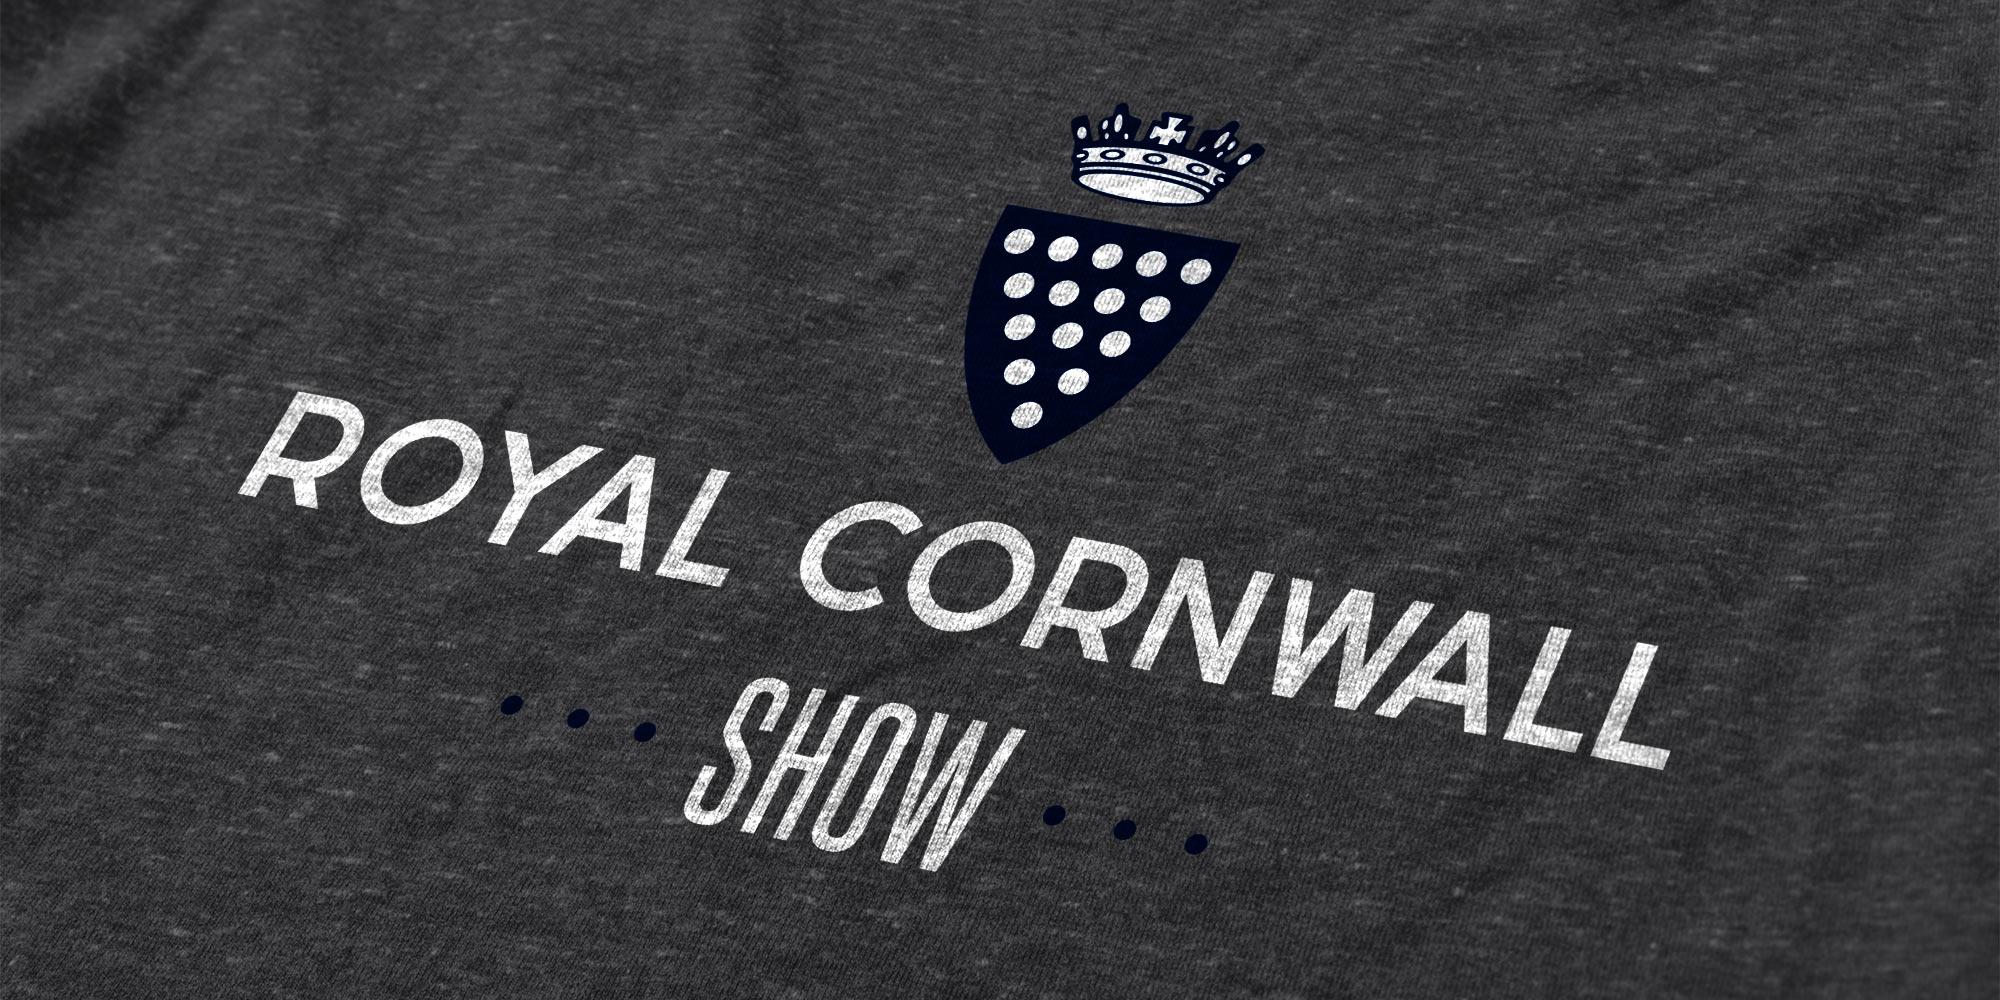 Royal Cornwall Show Print Design